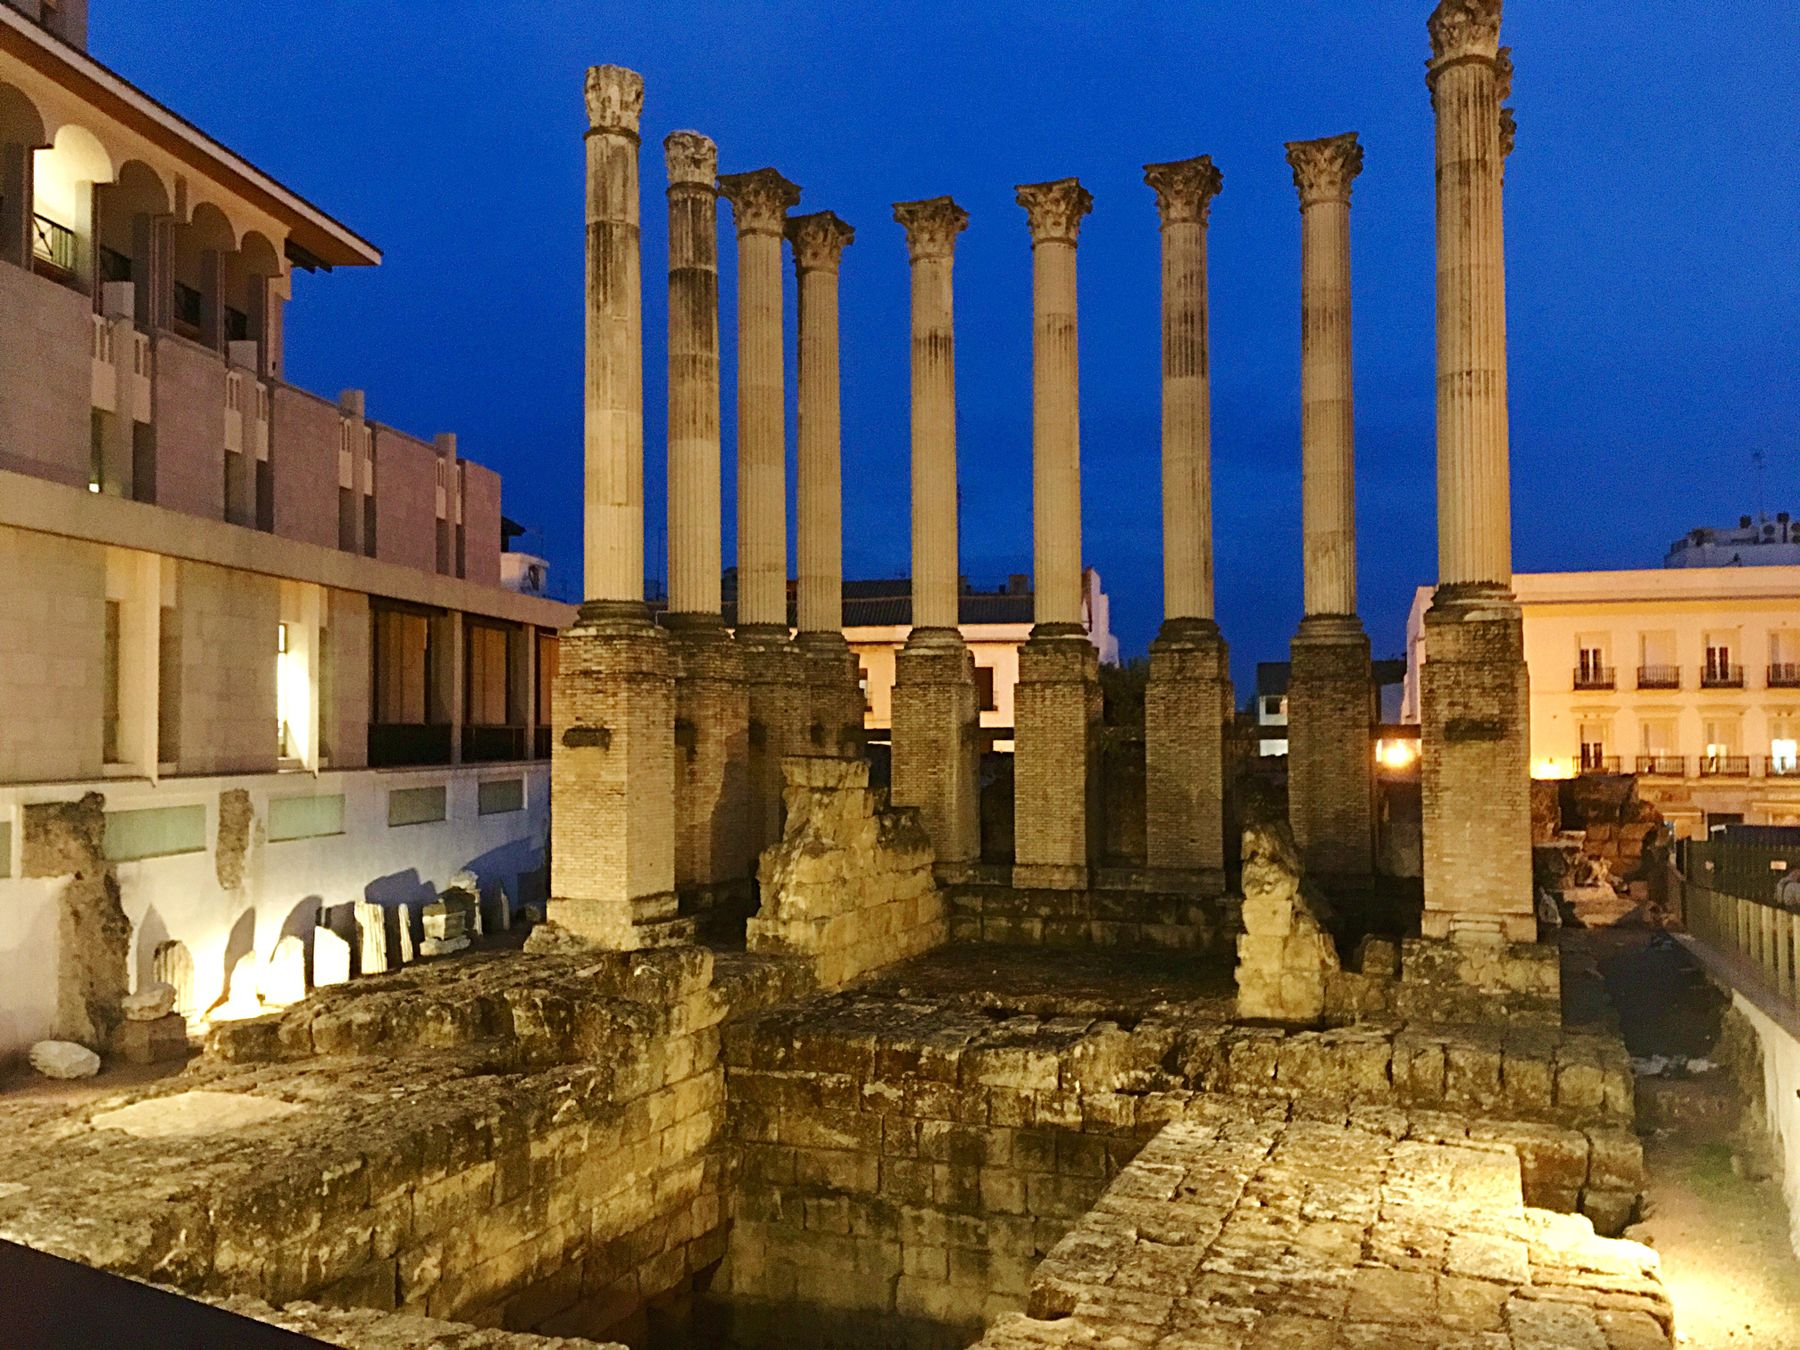 Templo romano de Córdoba al atardecer